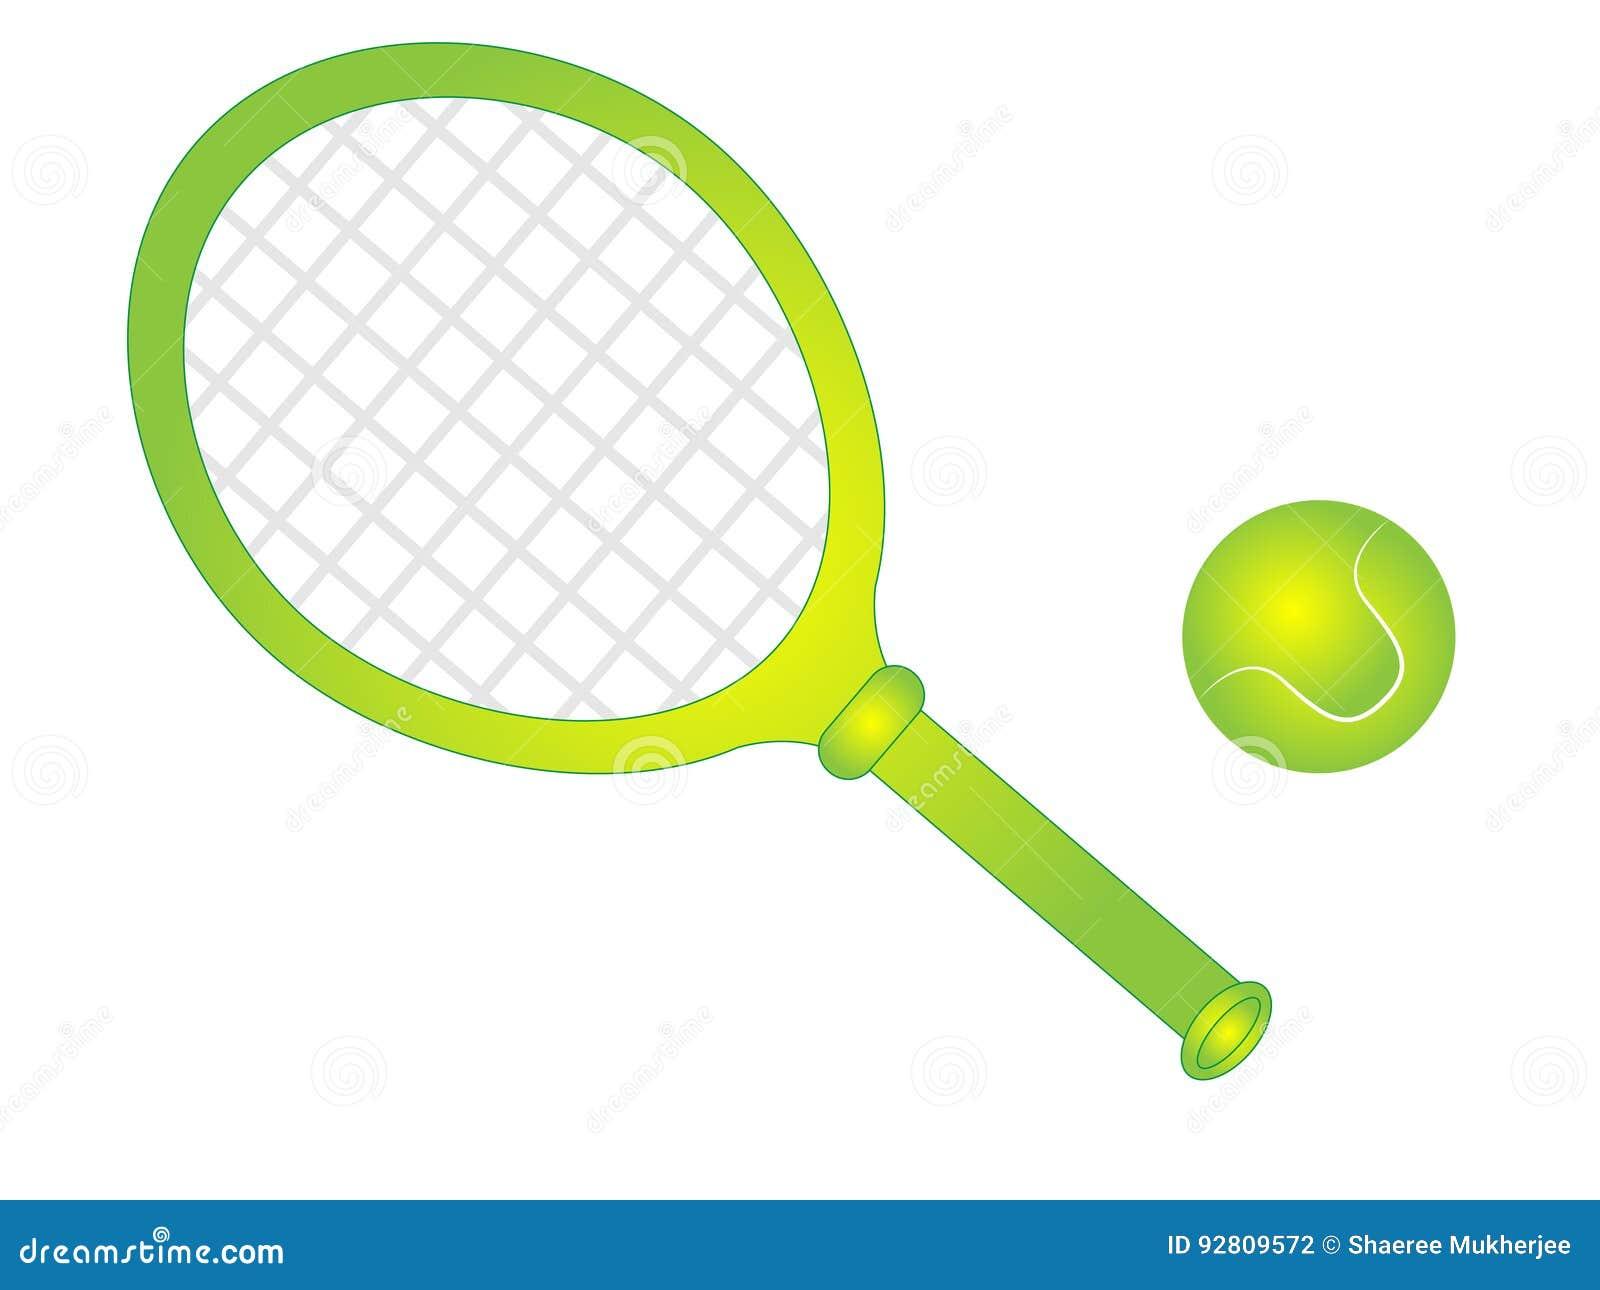 Cartoon Vector Tennis Racket With Tennis Ball Stock Vector